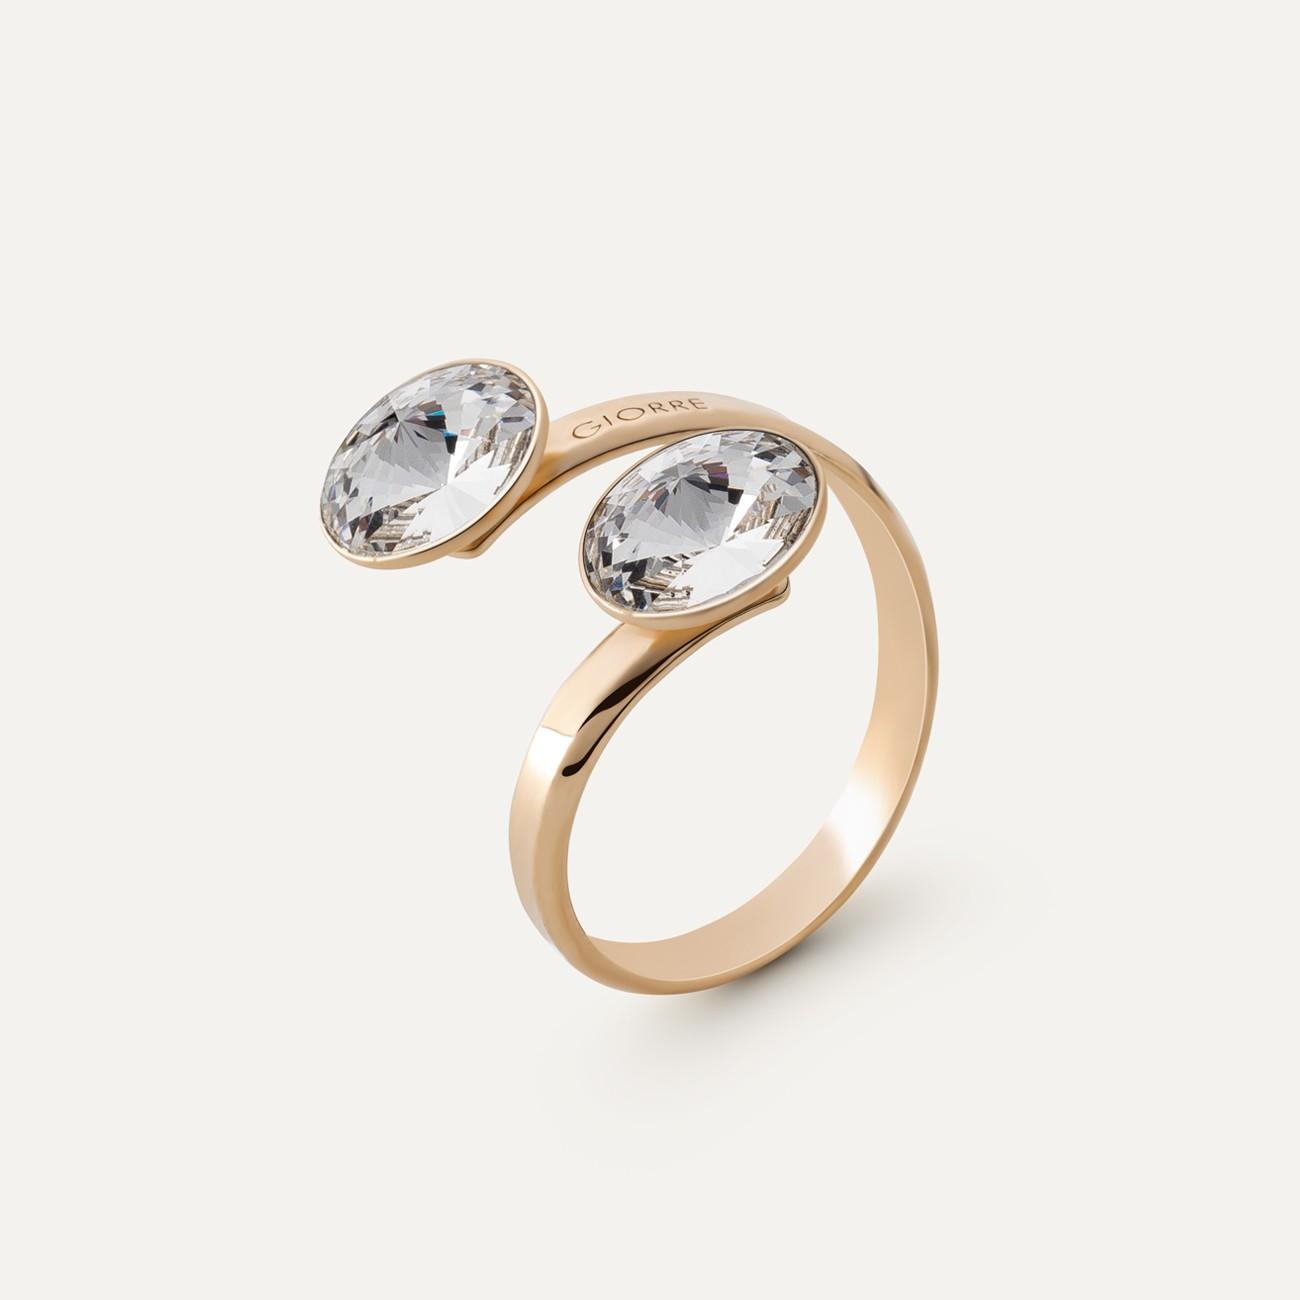 Rivoli ring with 2 stones 8mm, Swarovski